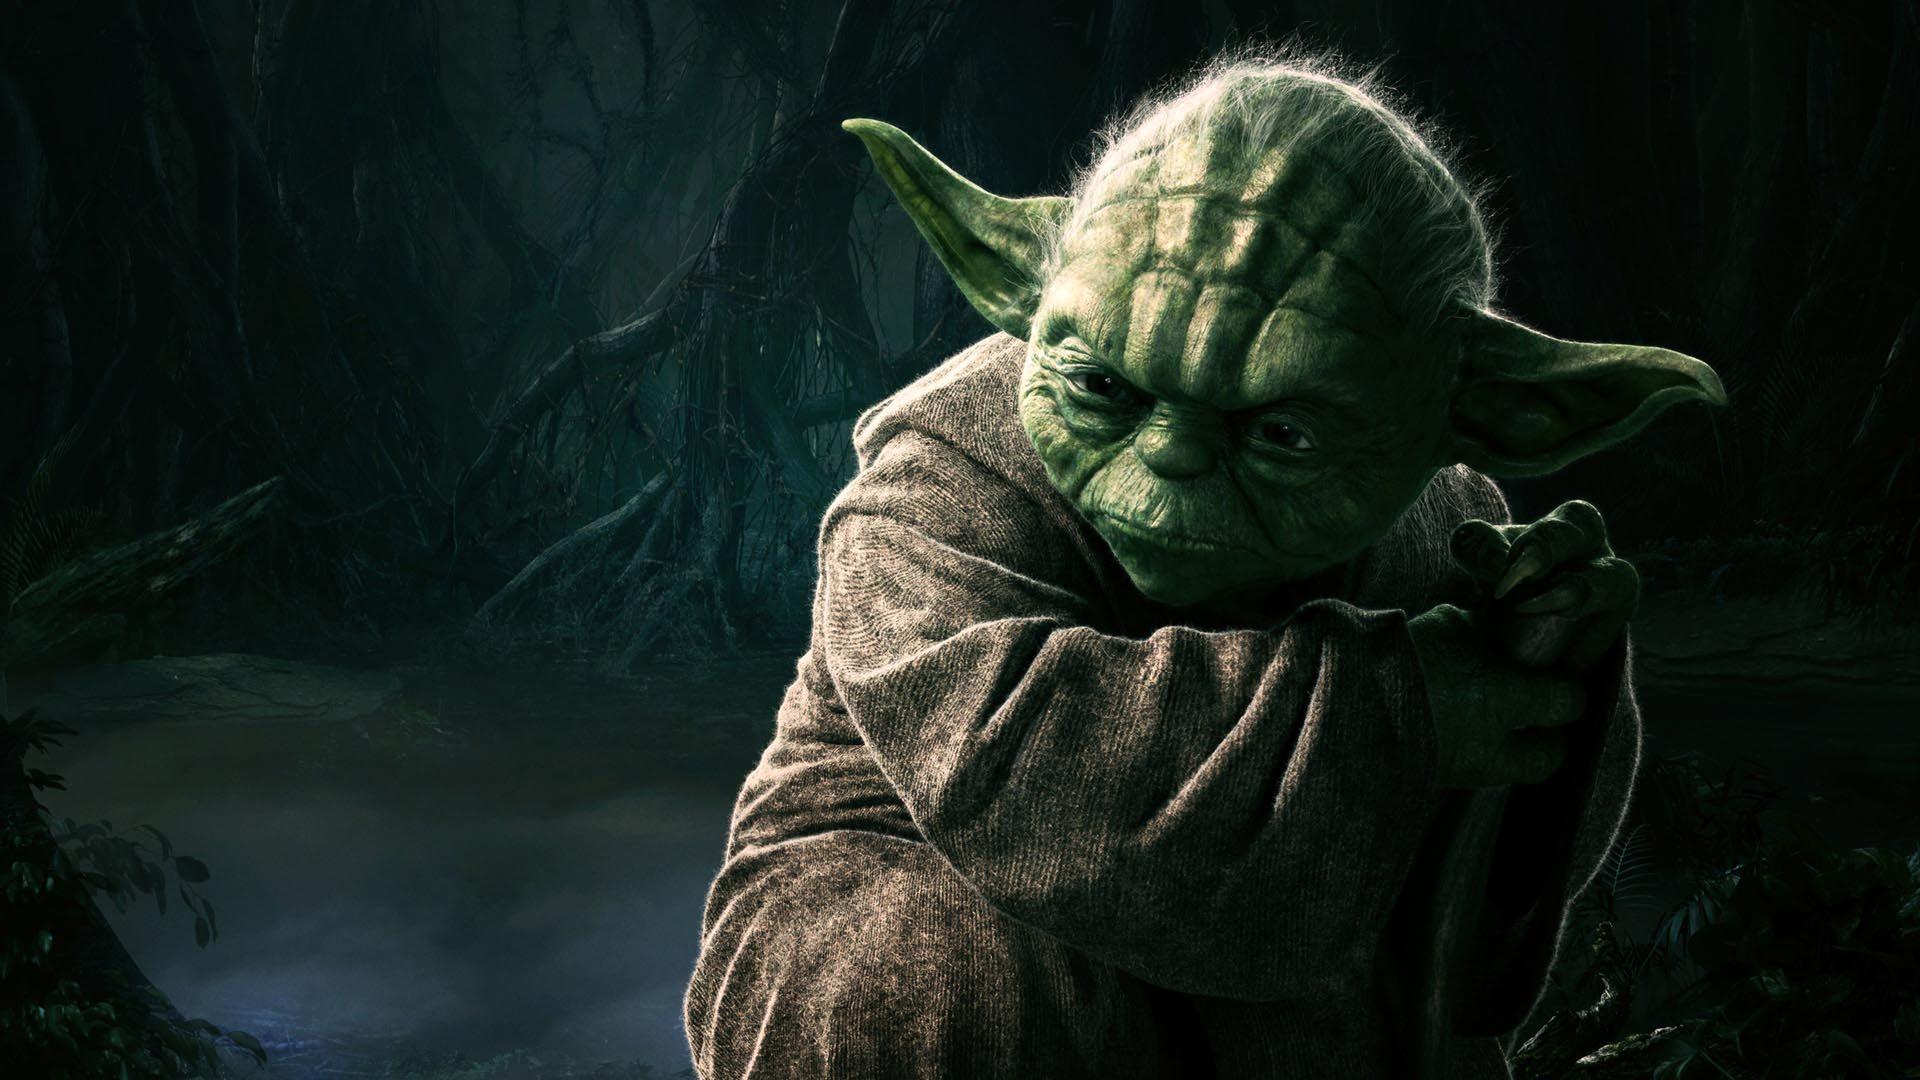 Star Wars Yoda Hd Wallpaper Papel De Parede Star Wars Star Wars Poster Star Wars Meme